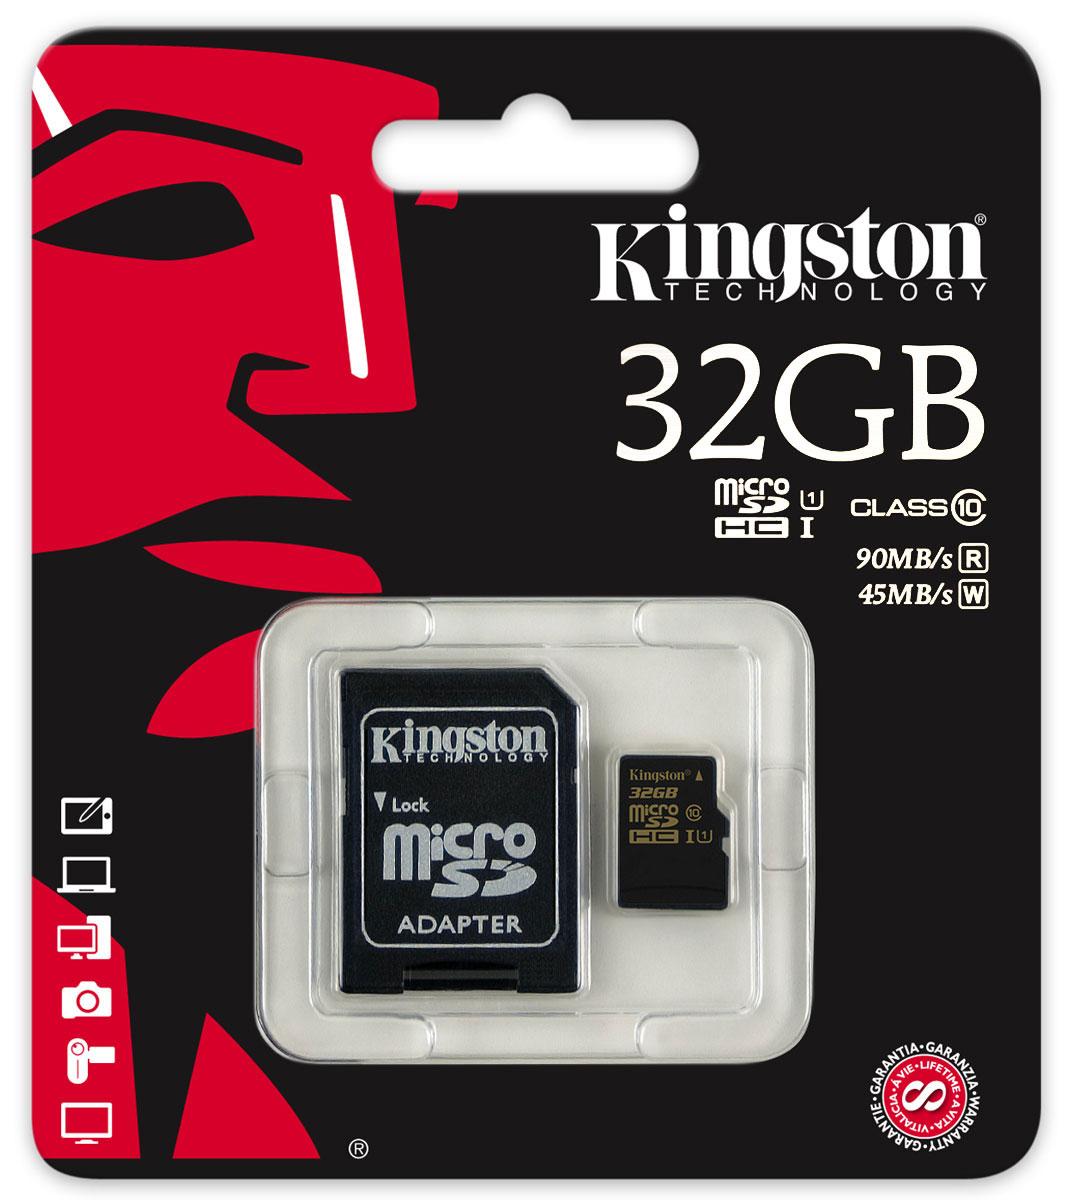 Kingston microSDHC Class 10 UHS-I 32GB карта памяти с адаптером